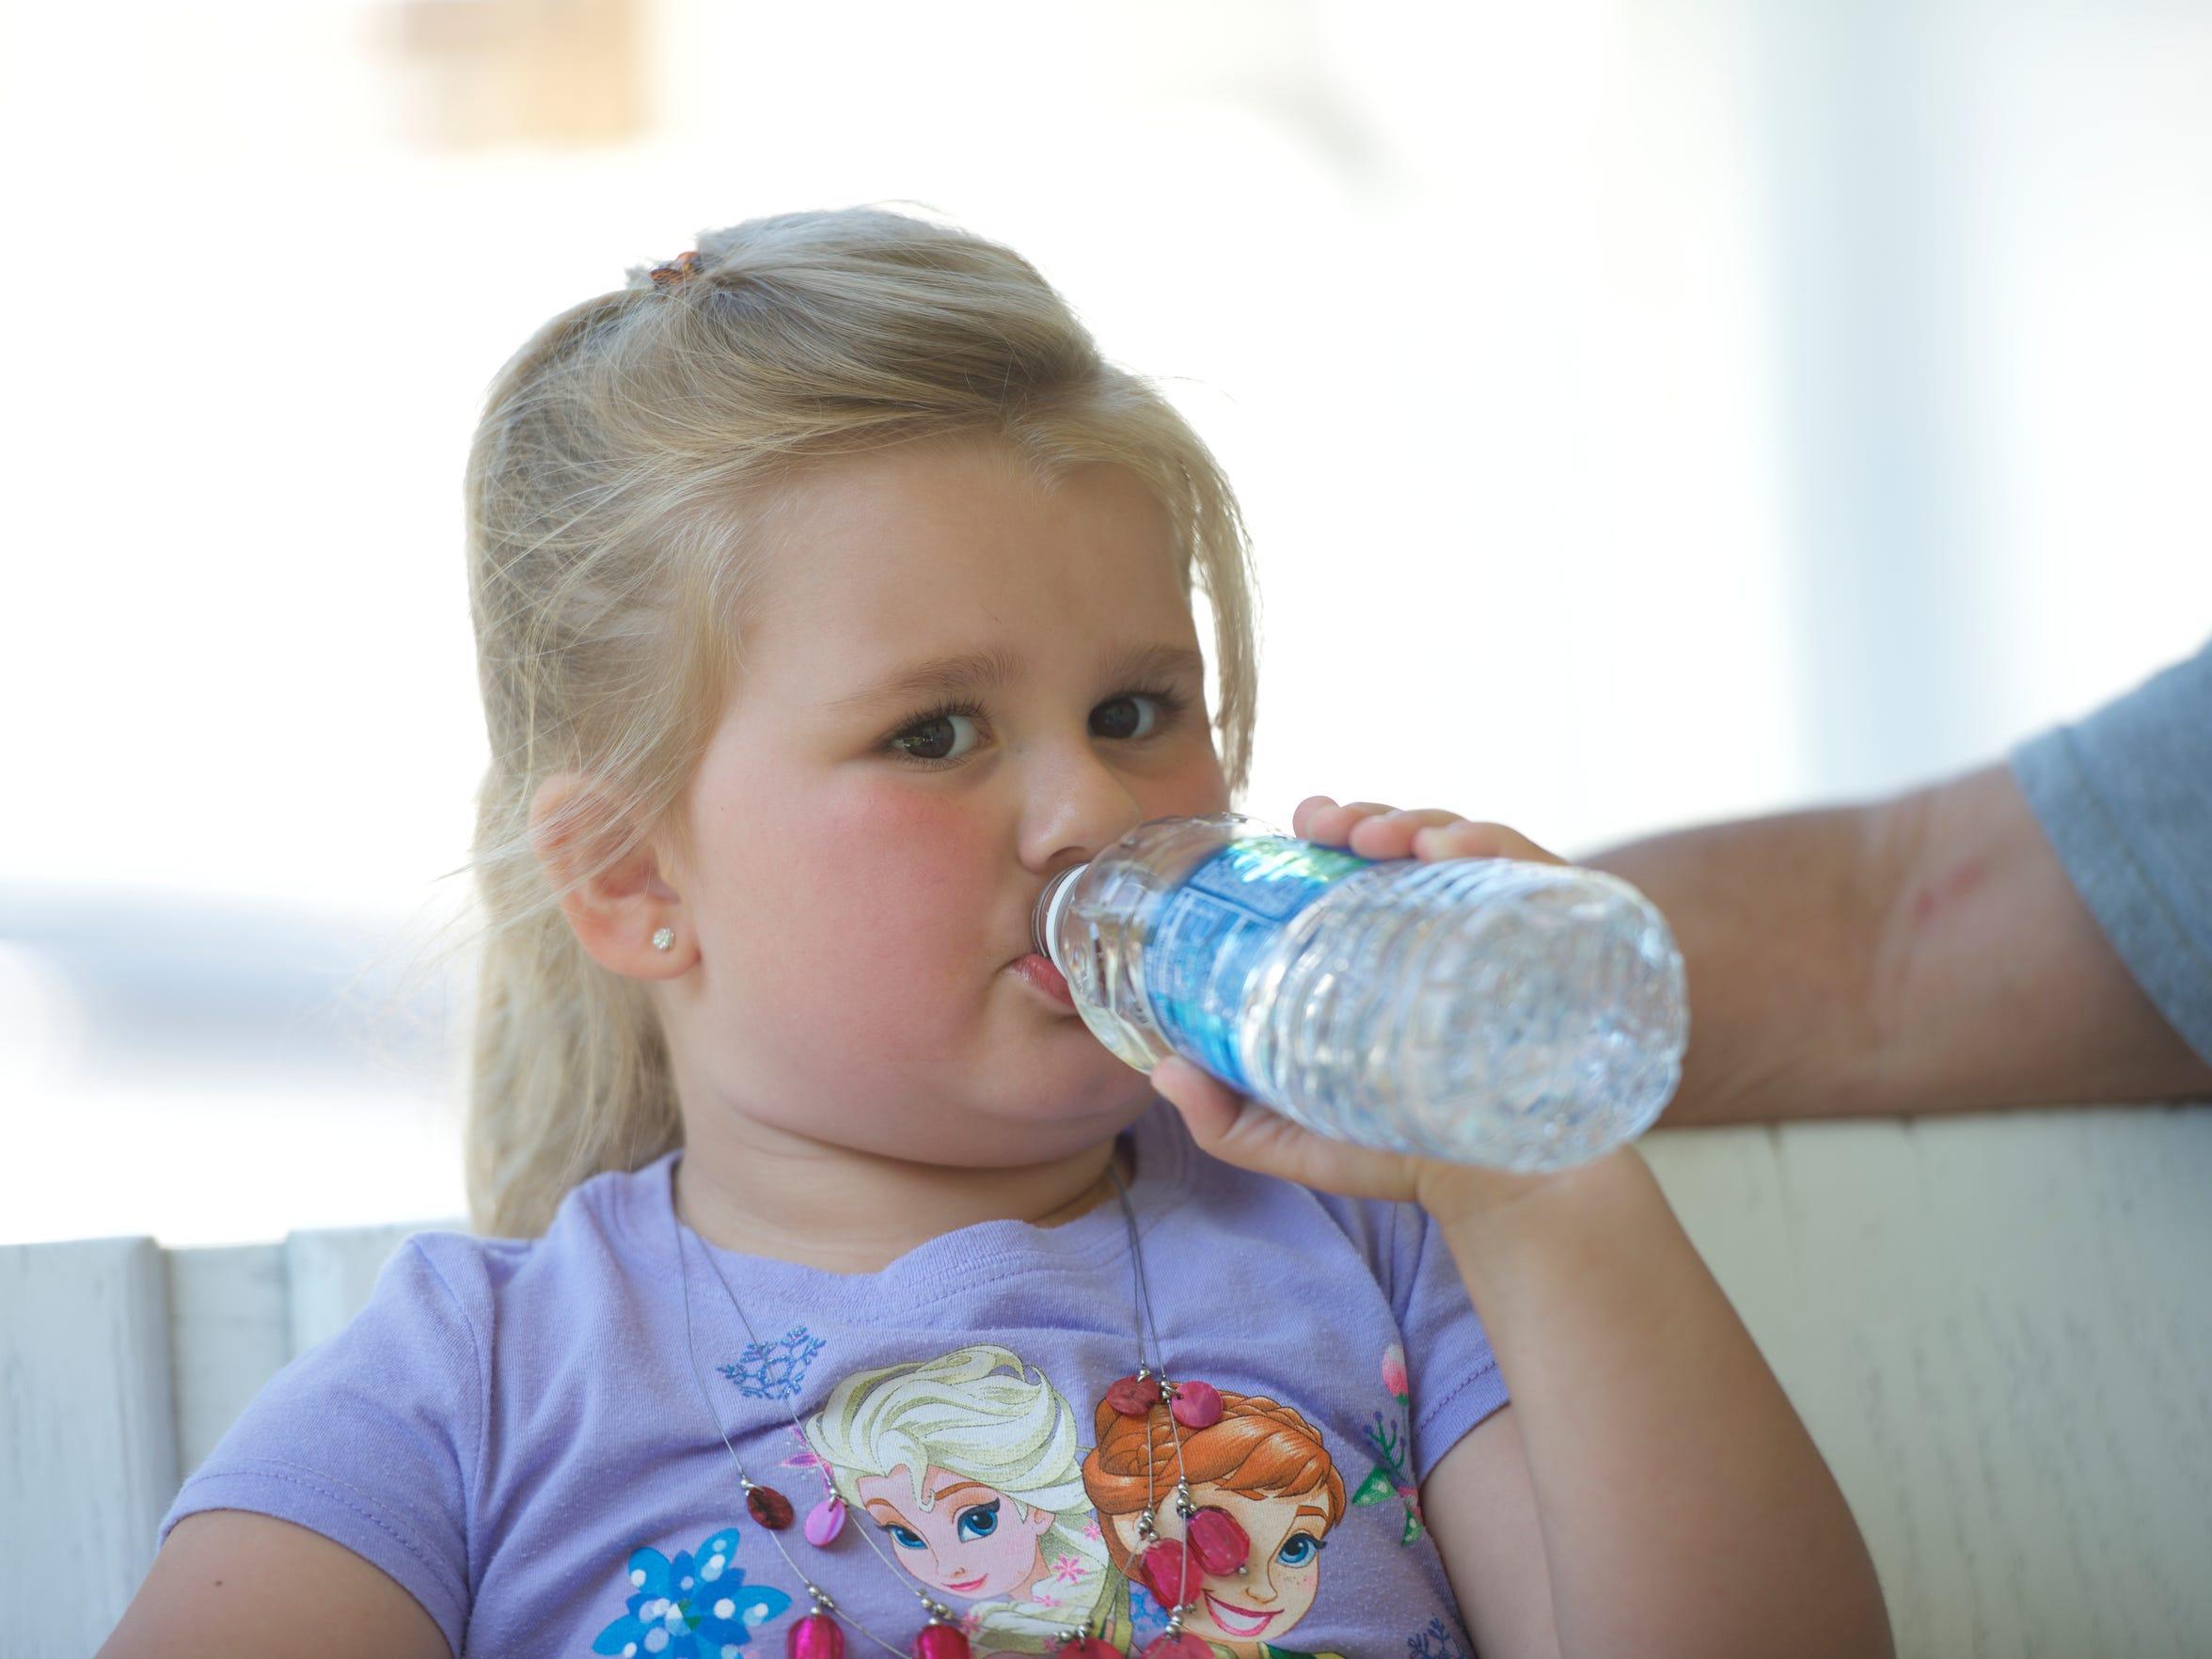 Kailyn Brooke Taylor, 5, of Coal Mountain, W.Va., drinks